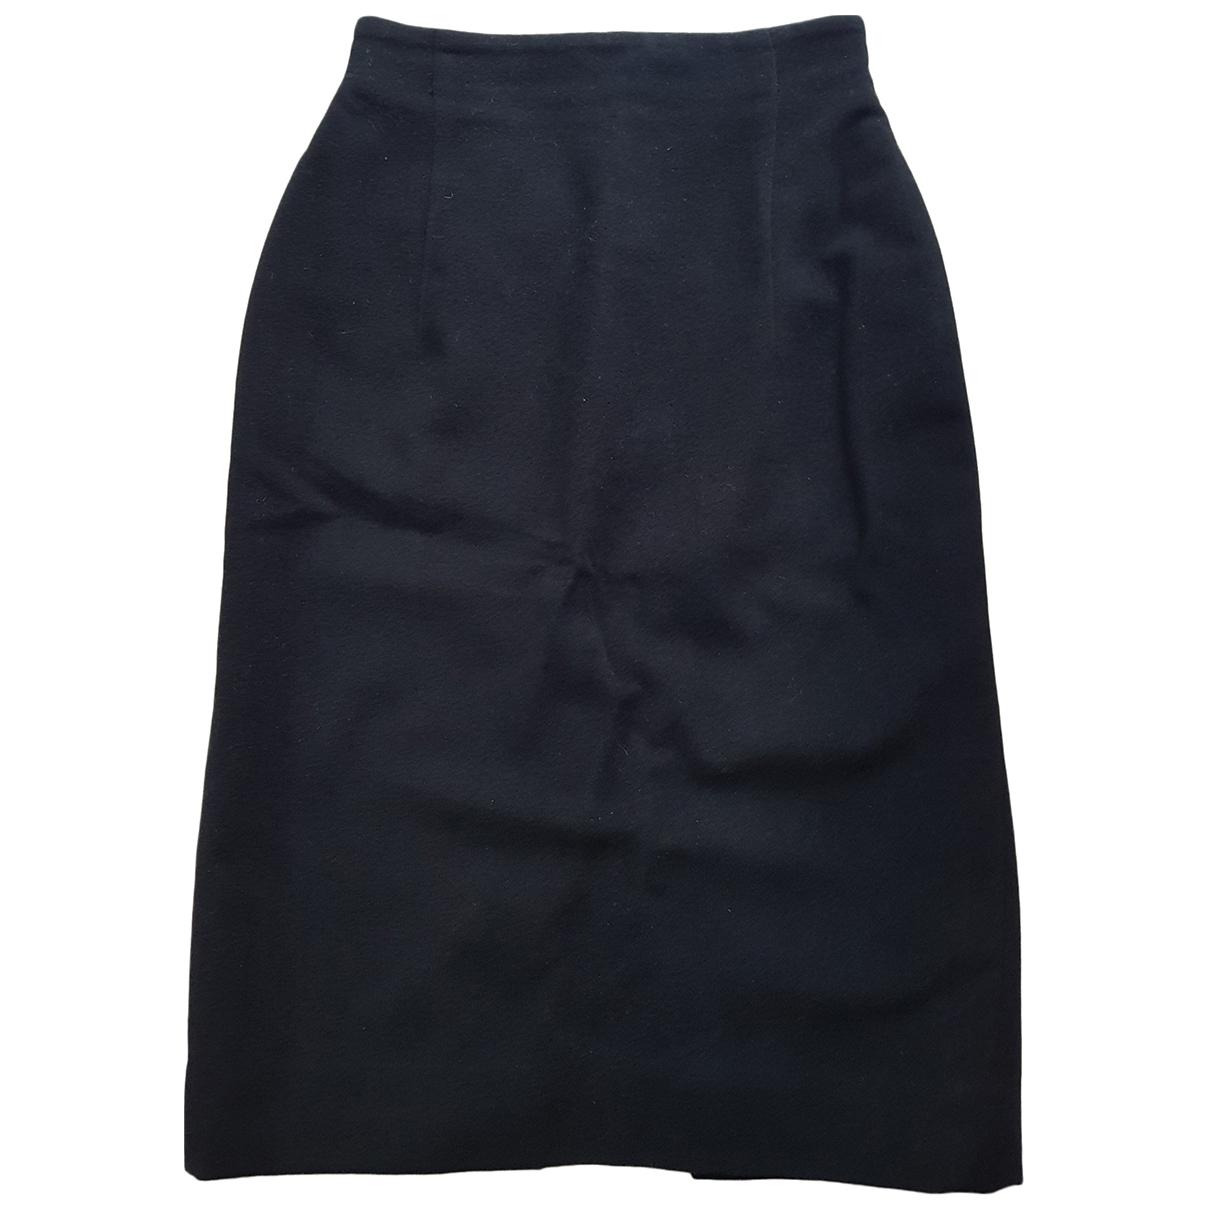 Jil Sander \N Black Wool skirt for Women XS International